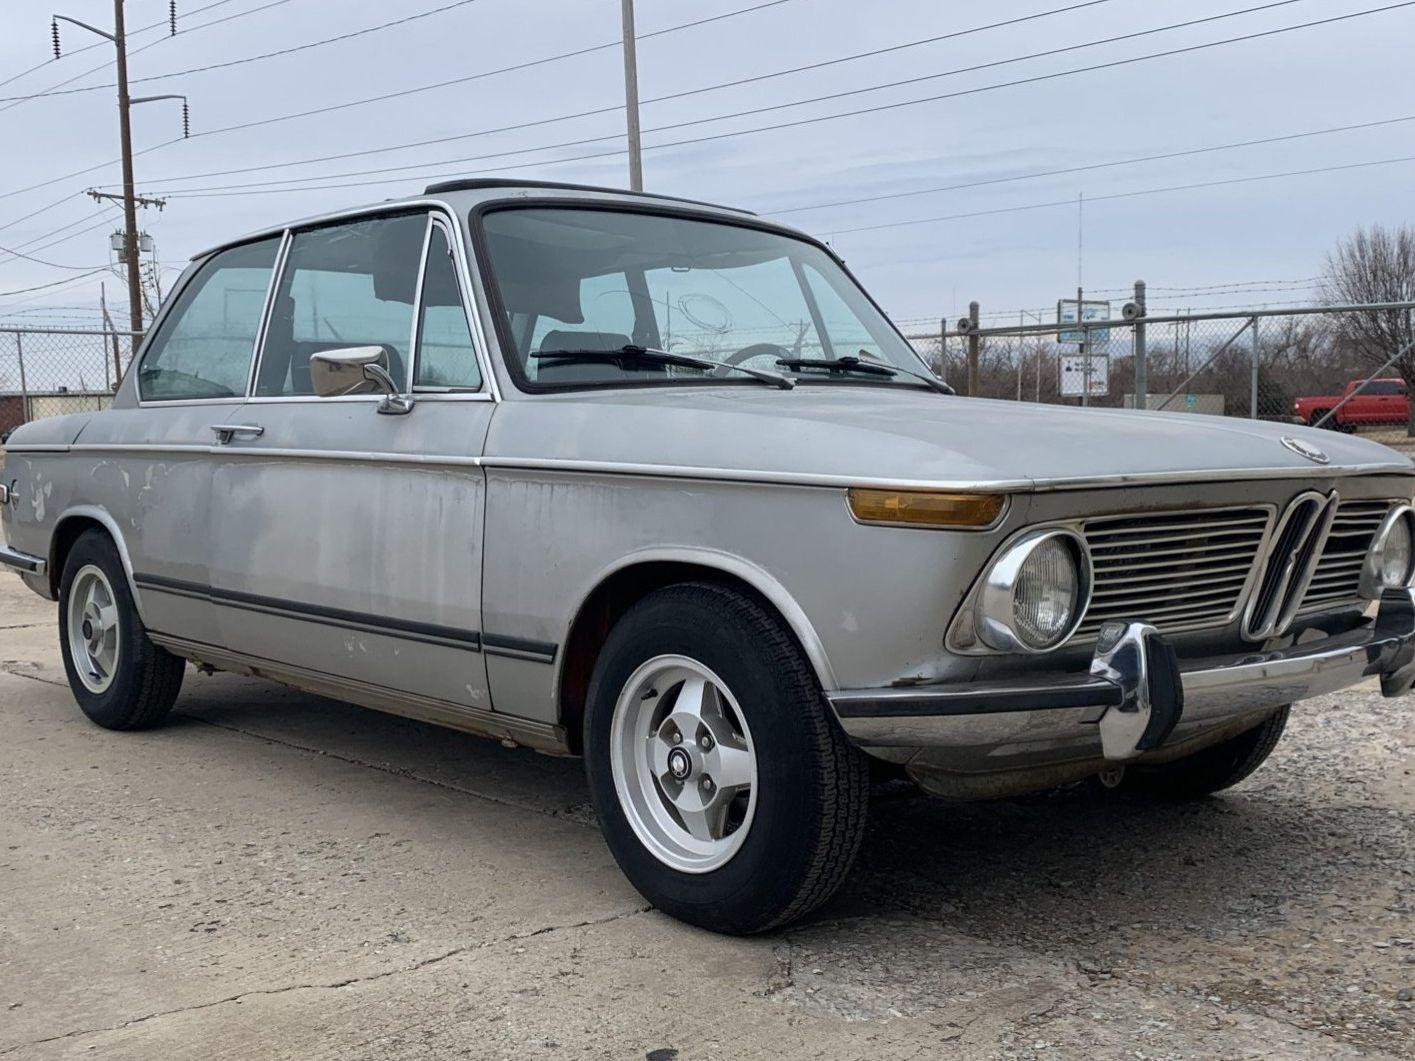 1972 BMW 2002 Project